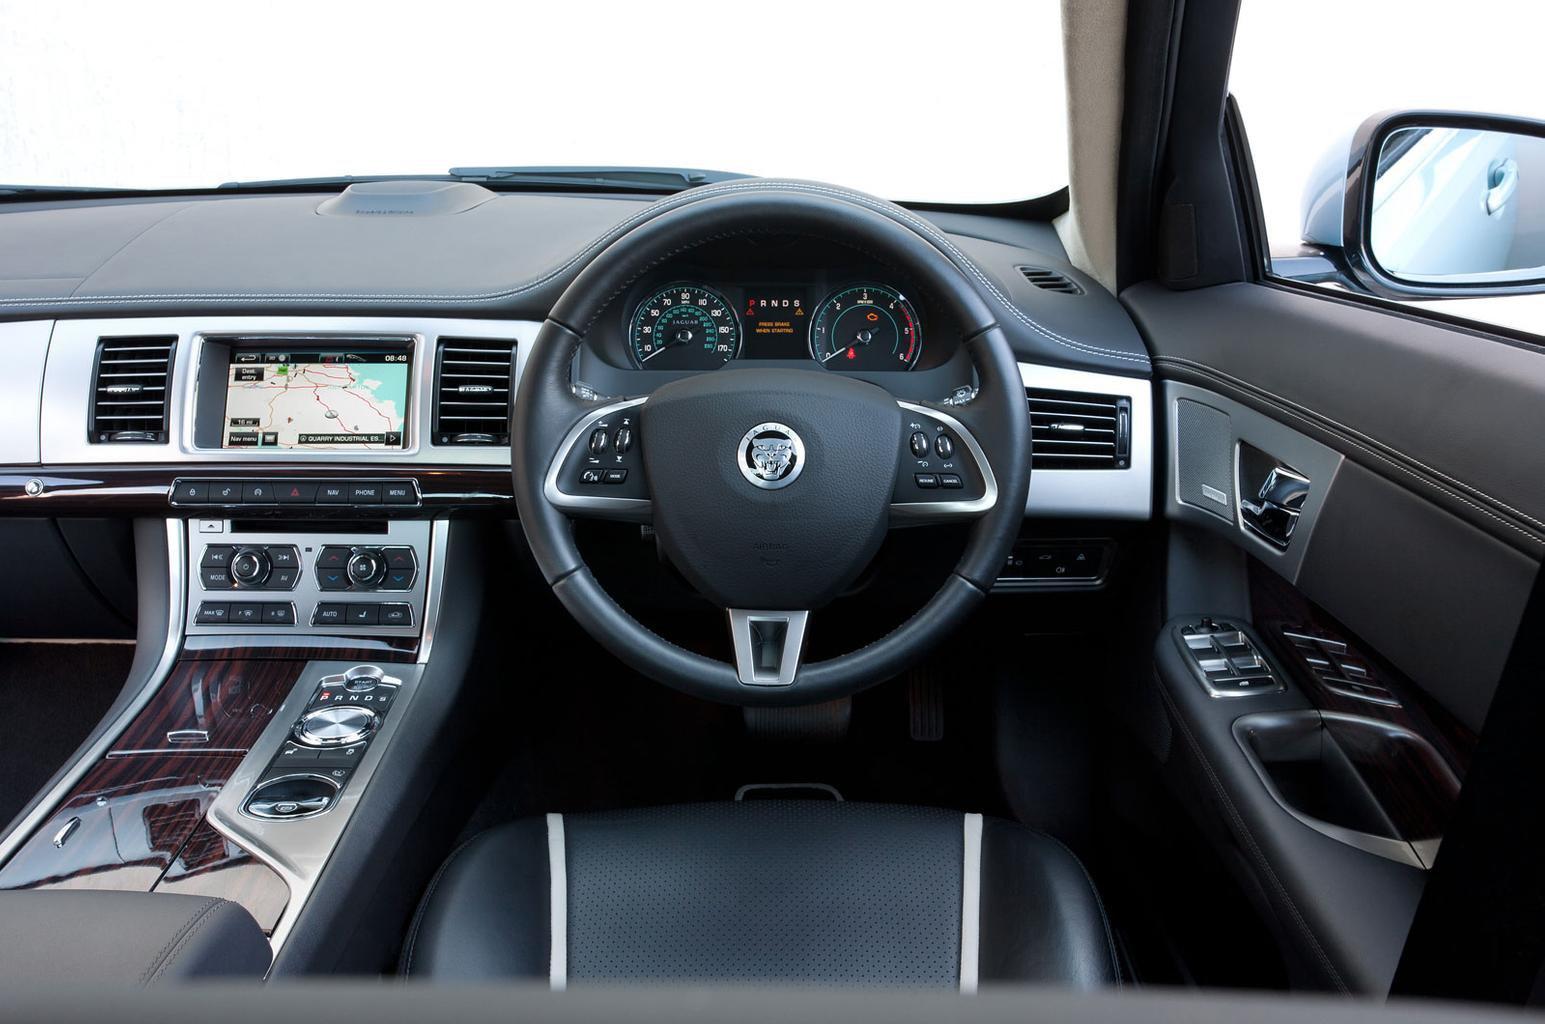 Jaguar XF (2010-2015)